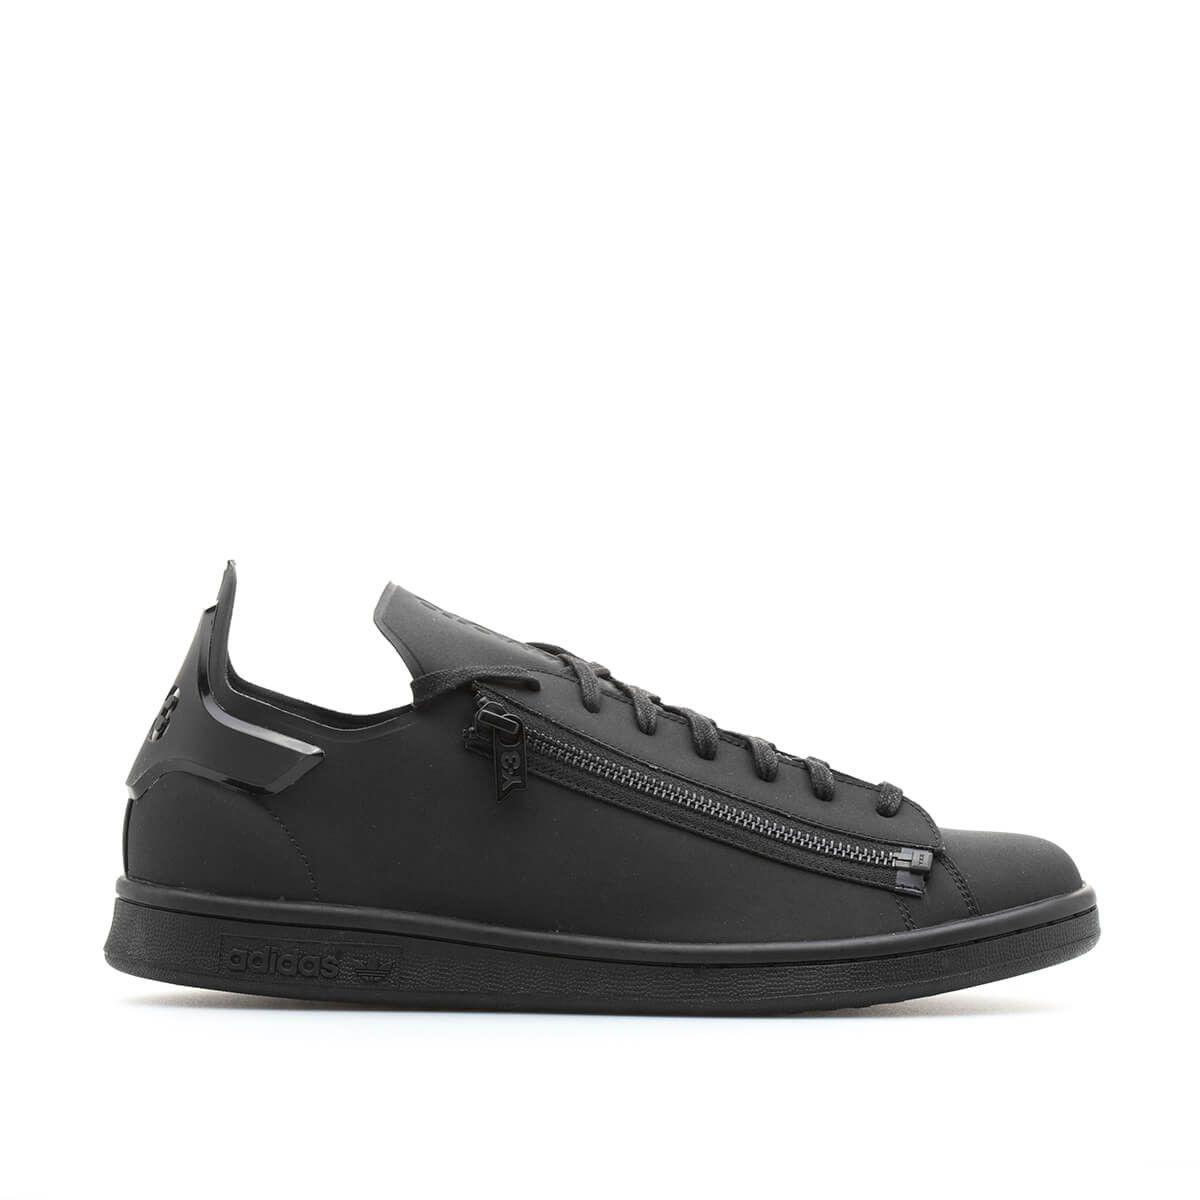 zip sneakers - Black Yohji Yamamoto XG34r5srT